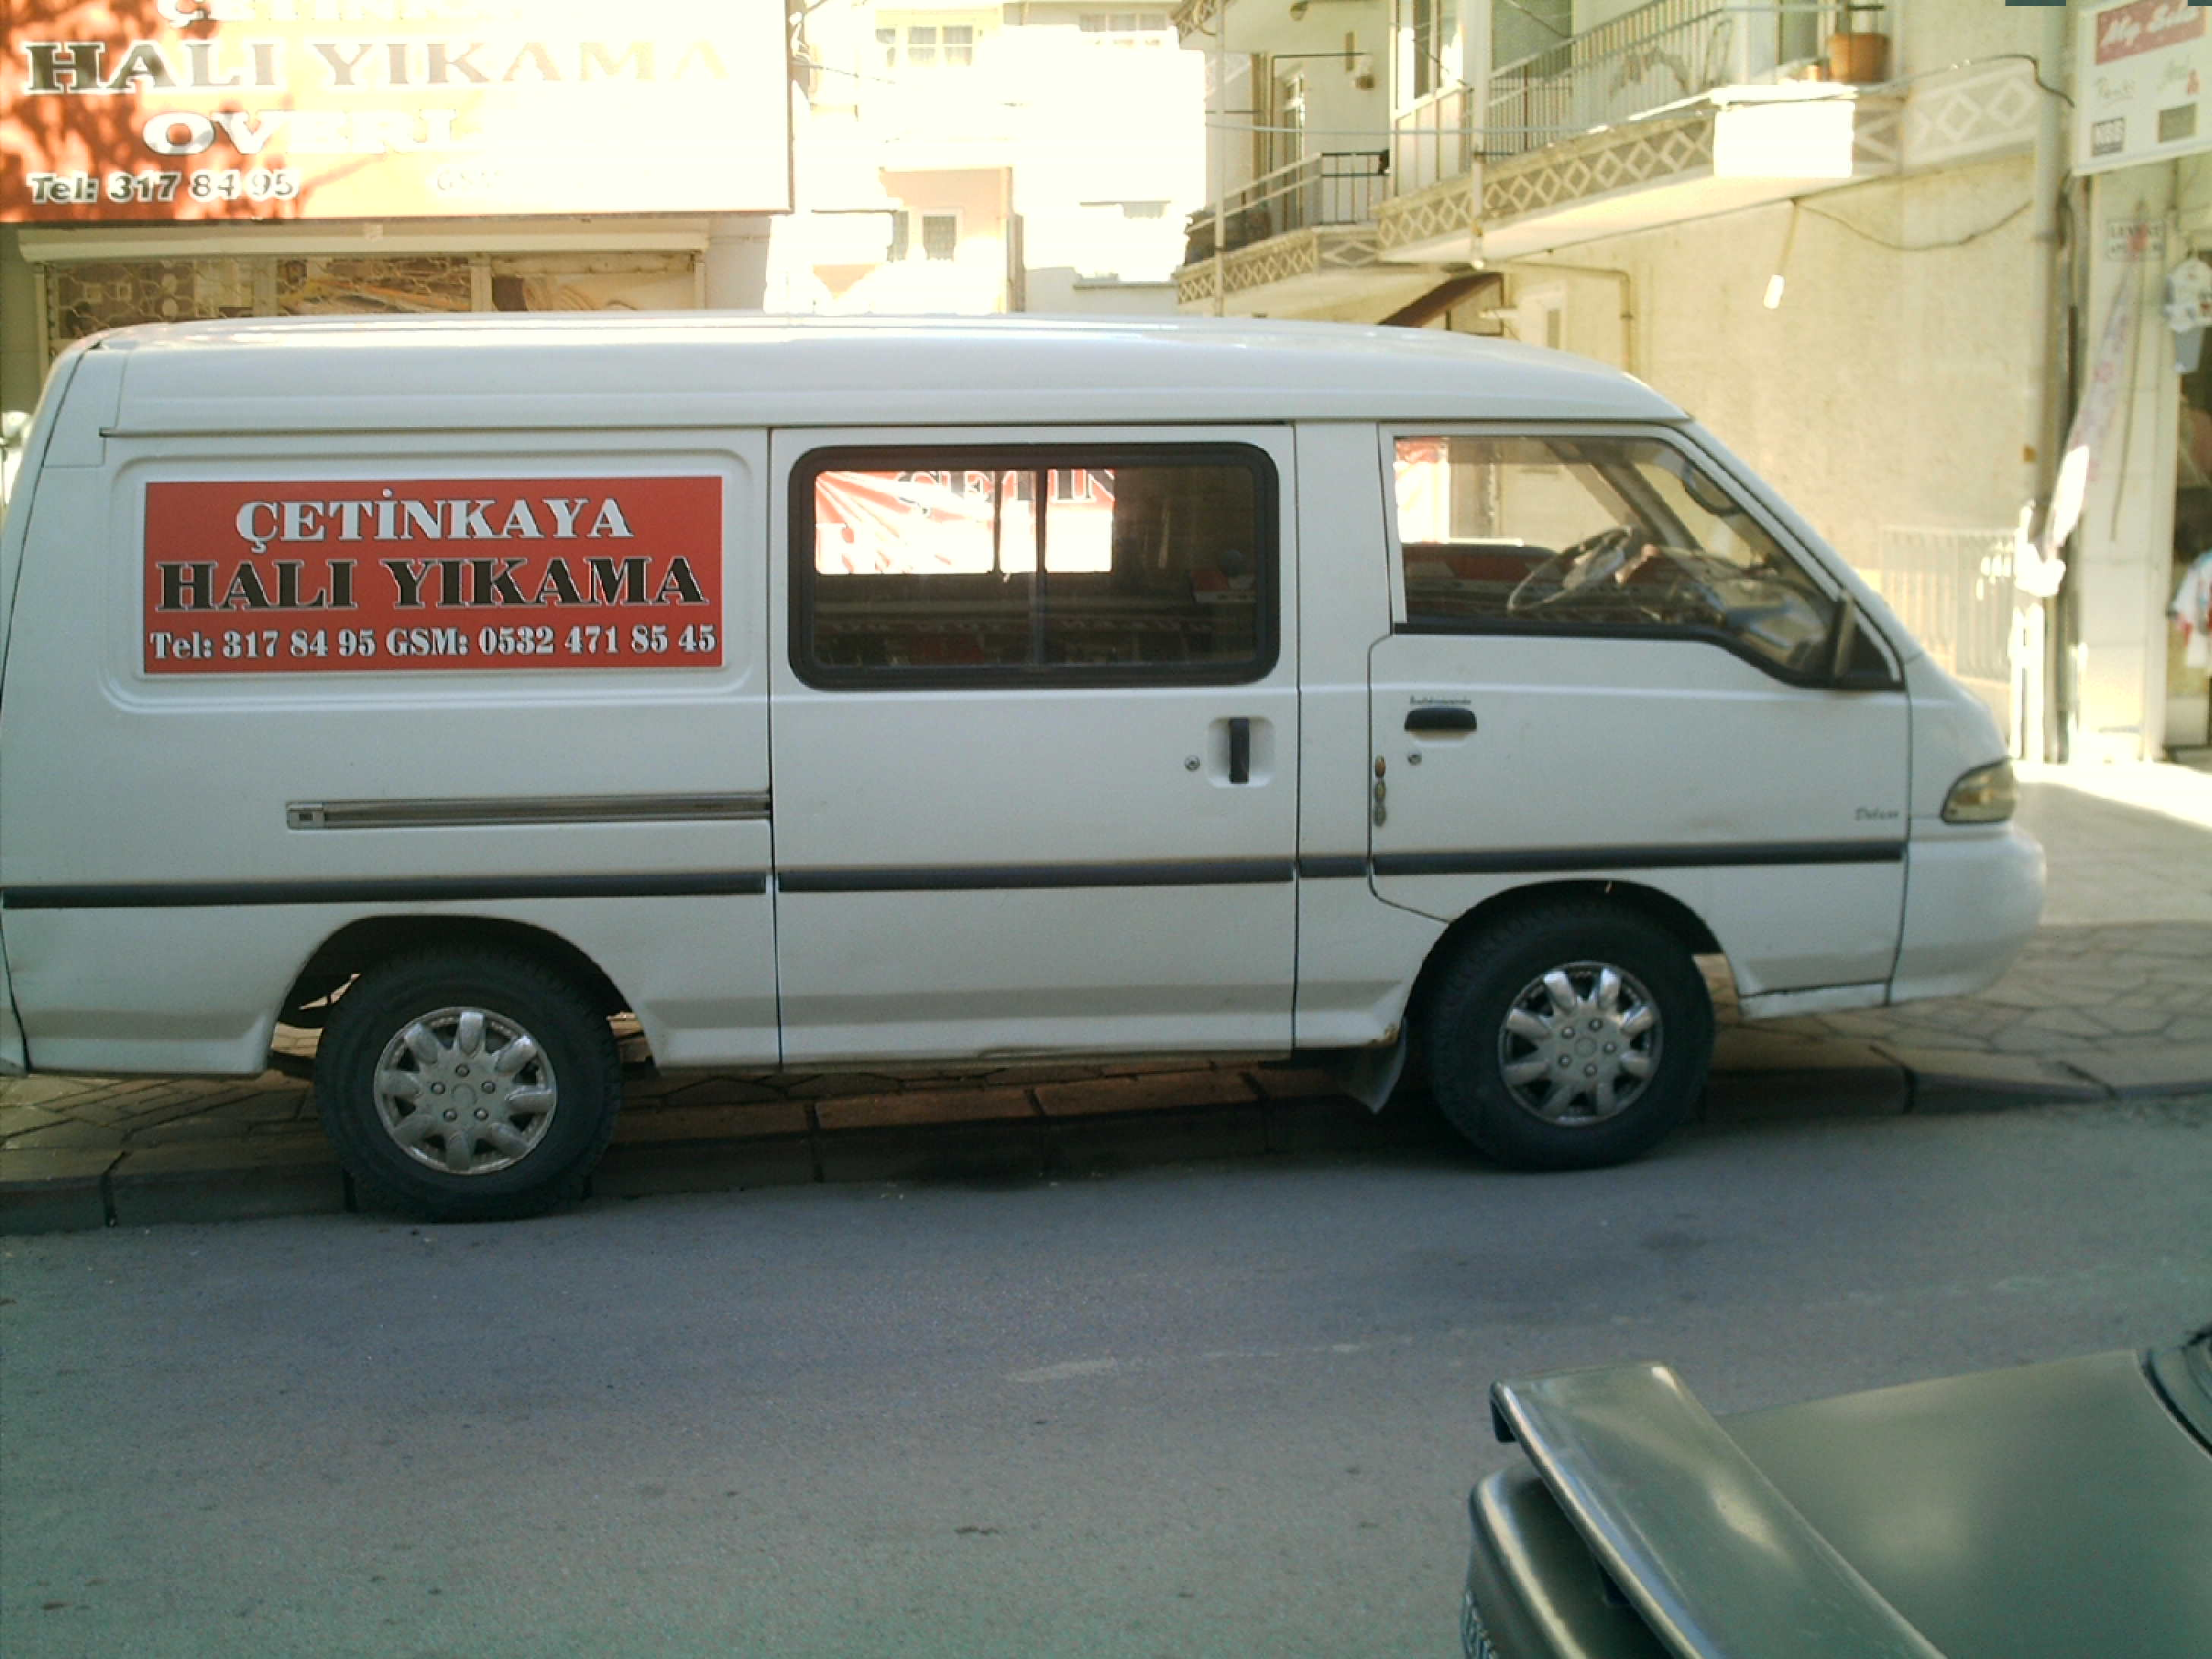 emniyet_hali_yikama_servis_araci